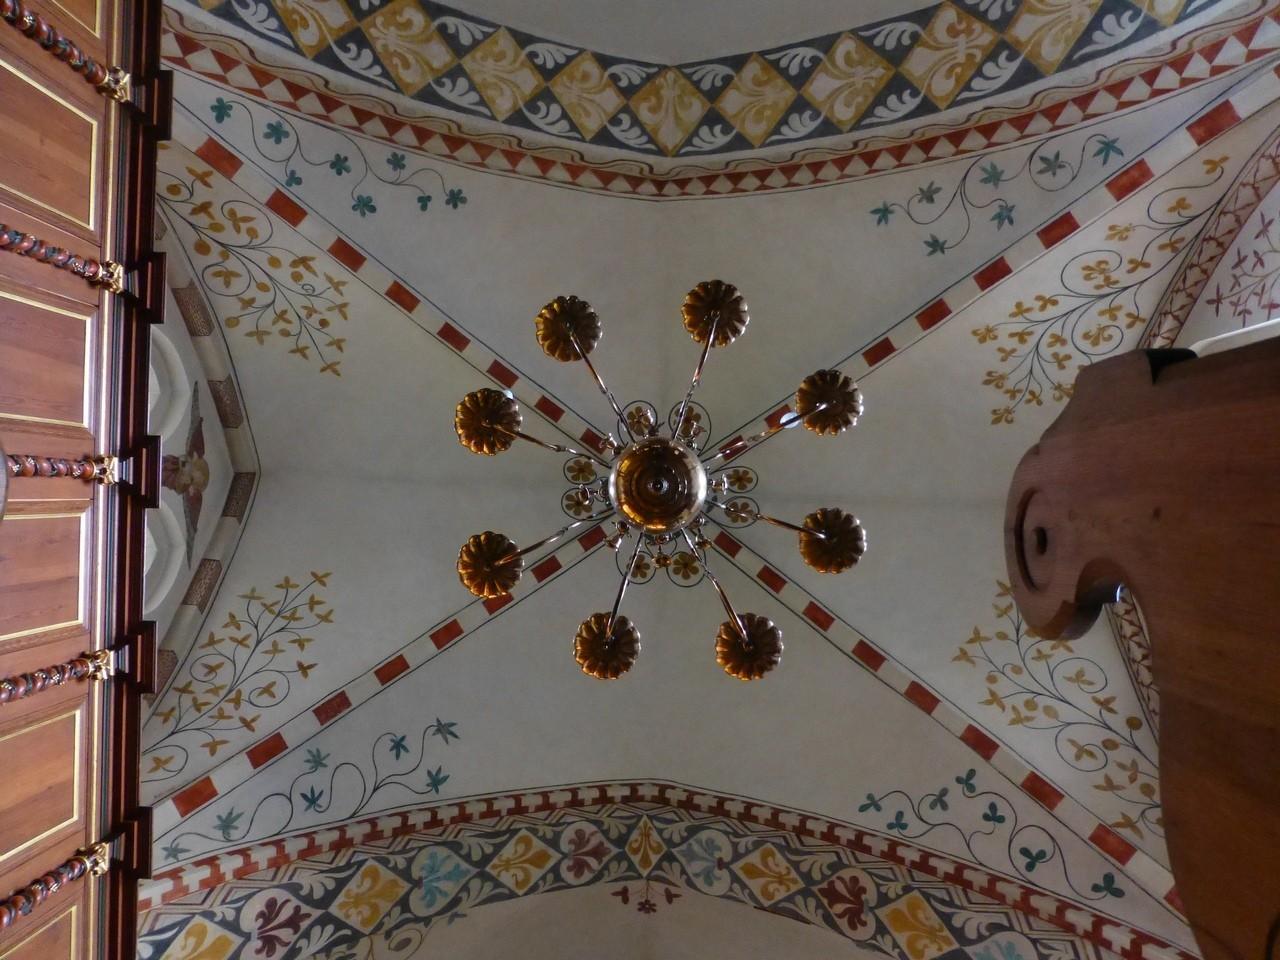 Maria-Magdalenen-Kirche zu Berkenthin - Kronleuchter 2 mit Deckenmalerereien /Foto P.Lüneburg